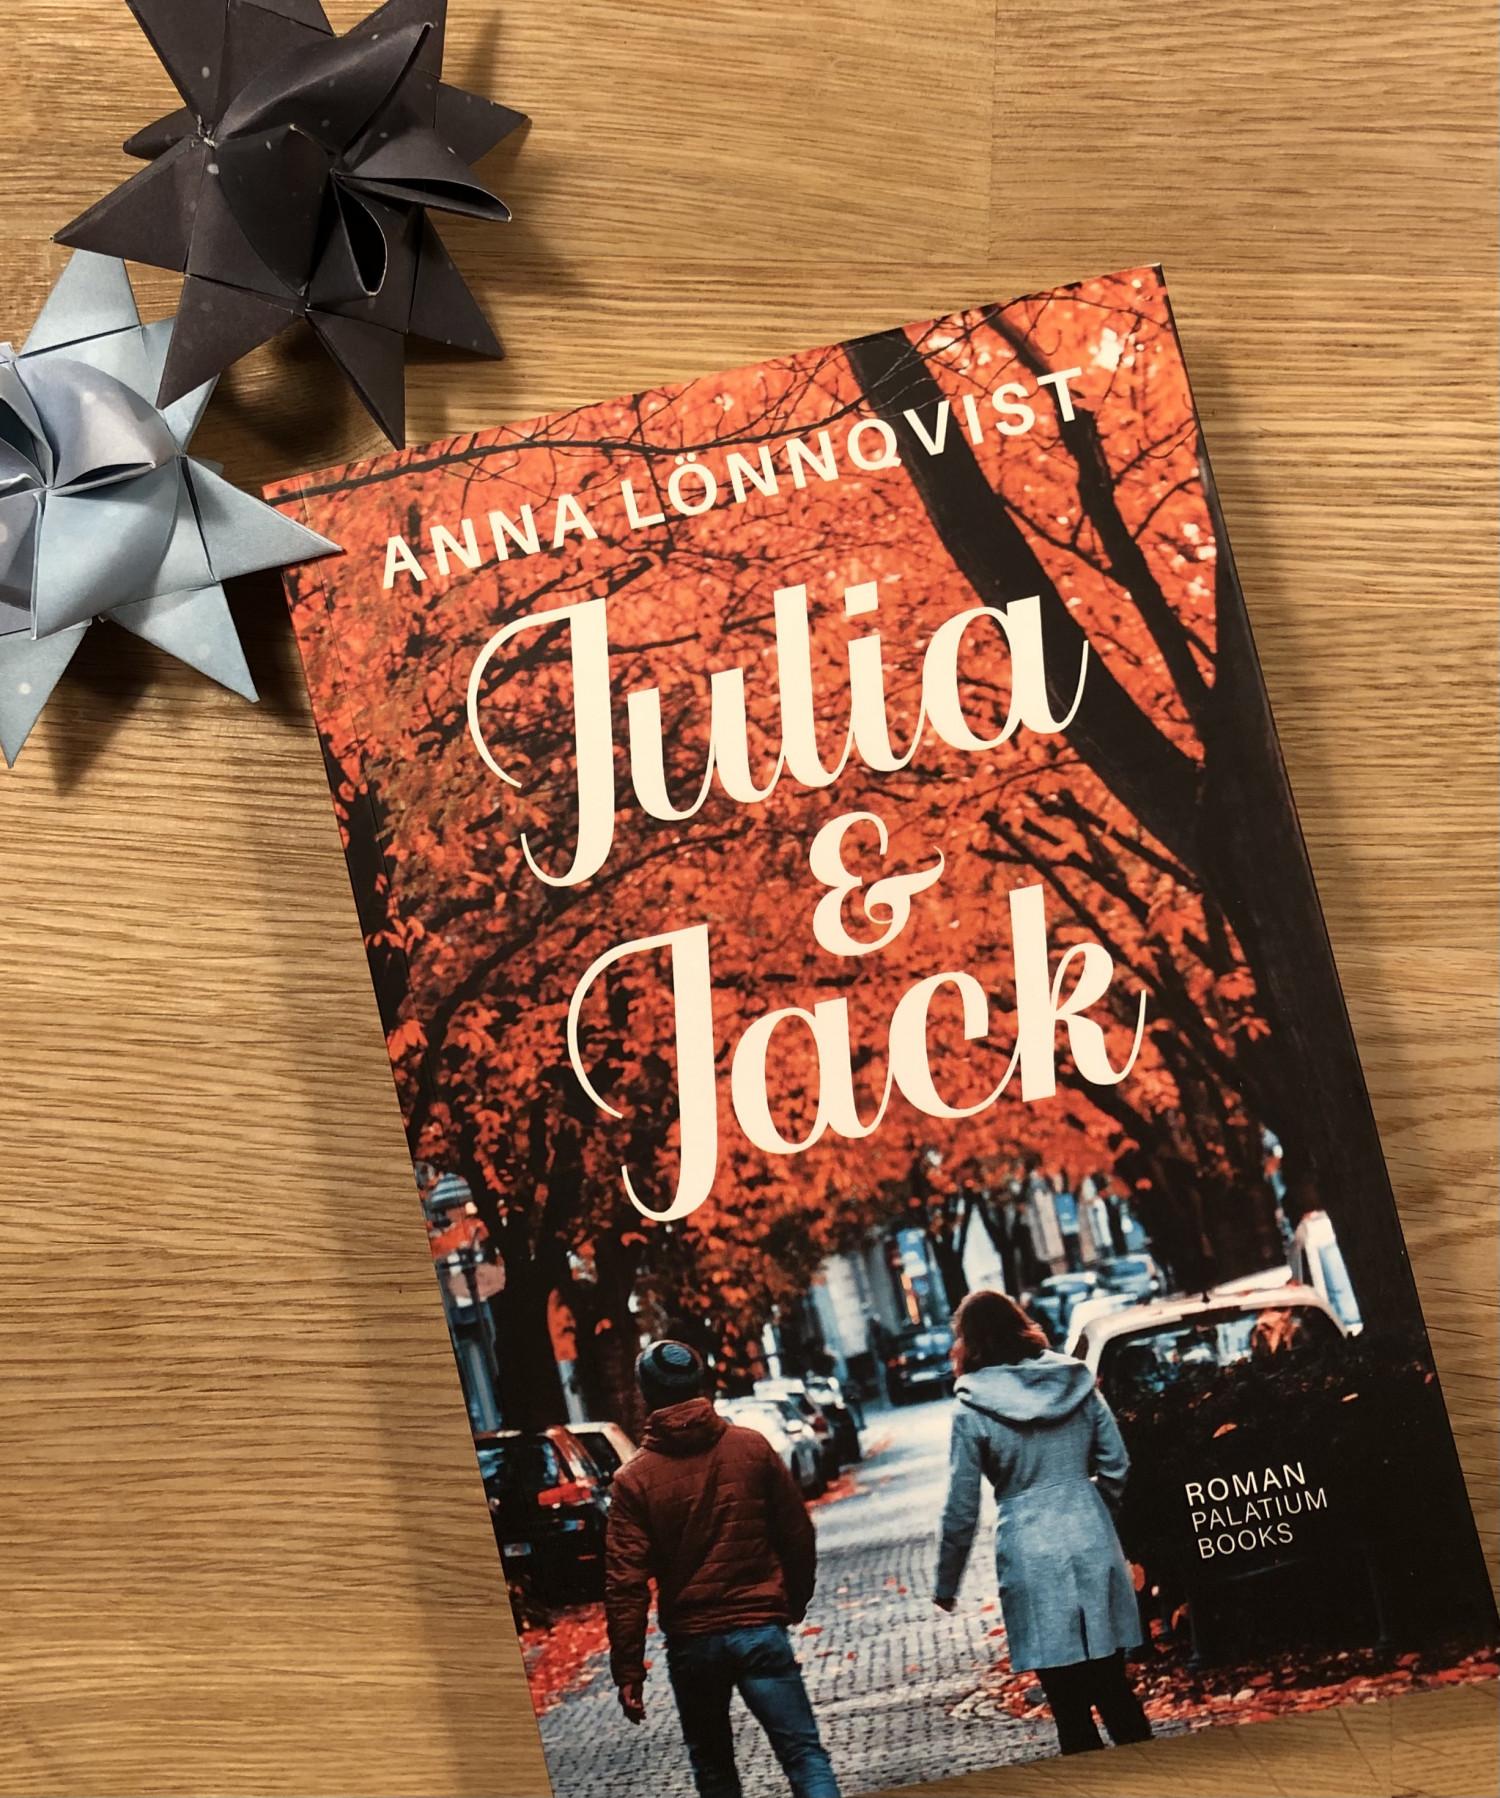 Julia og Jack, Julia & Jack, Palatium, Palatium Books, Anna Lönqvist, roman, kærlighed, krummeskrummelurer, krummeskrummelurer.dk, boganmeldelse, anbefaling, anmeldereksemplar,